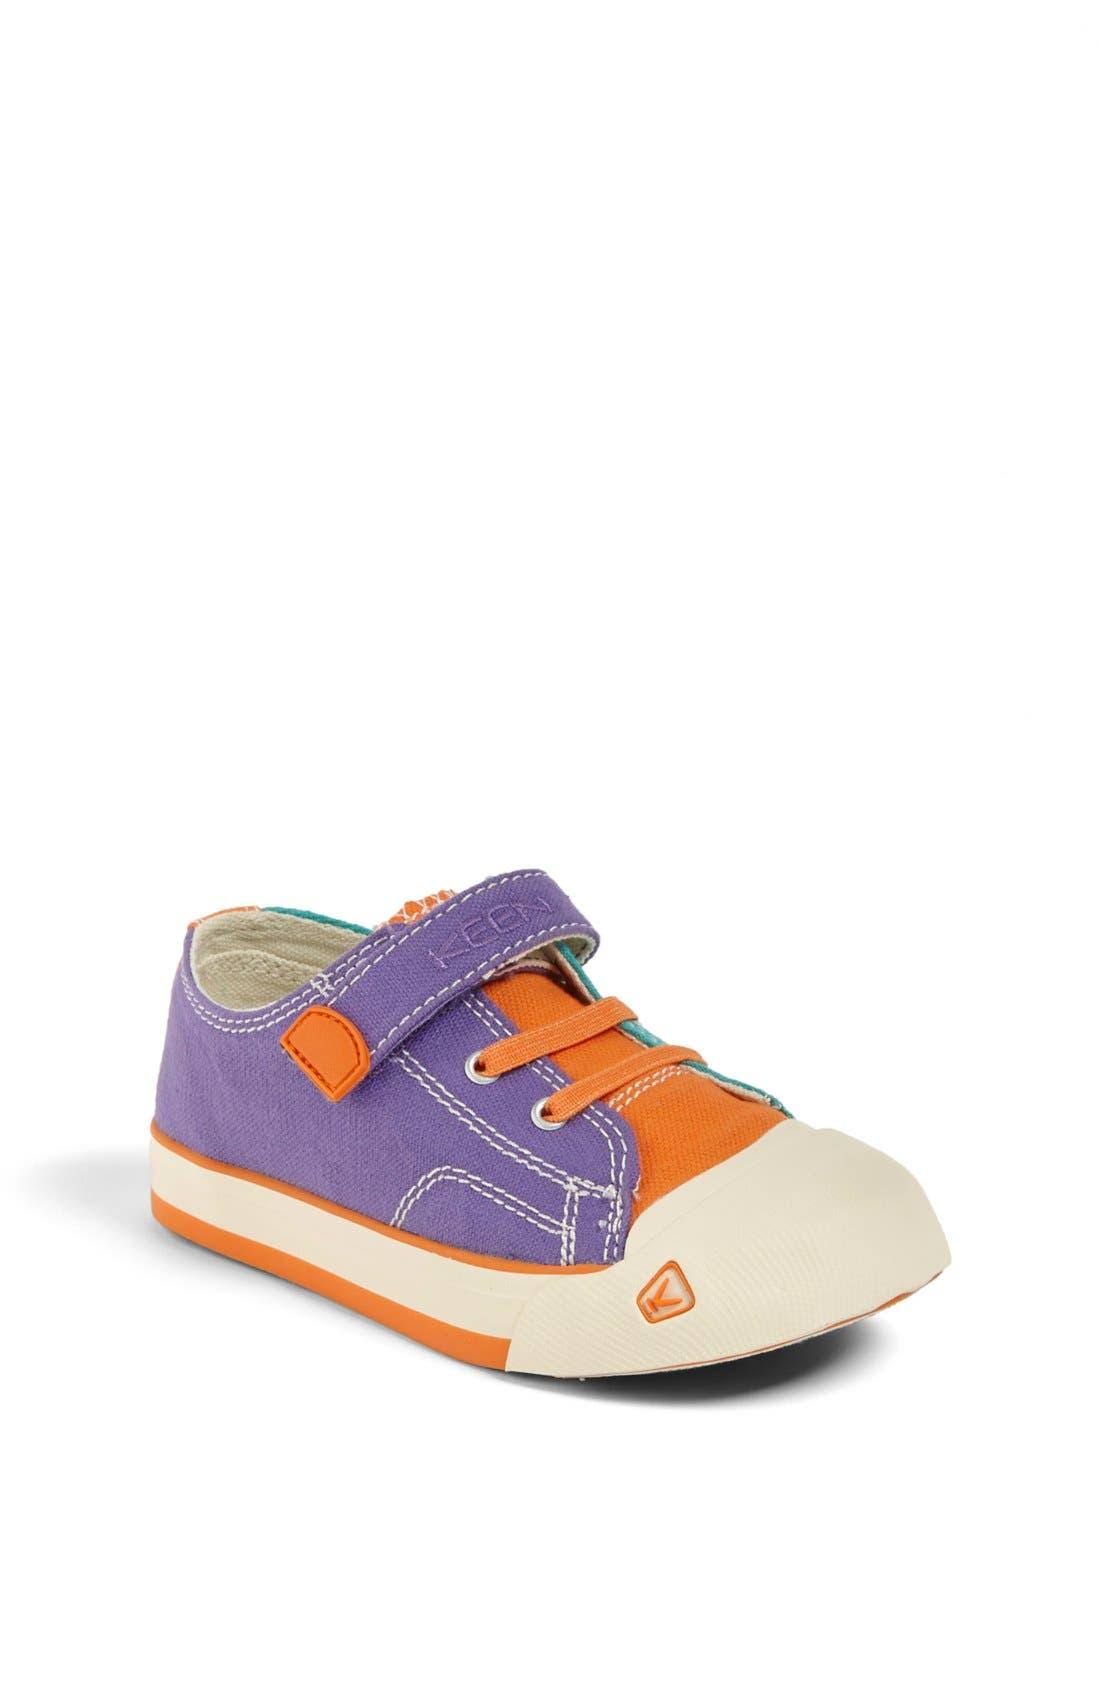 Alternate Image 1 Selected - Keen 'Coronado' Sneaker (Toddler & Little Kid)